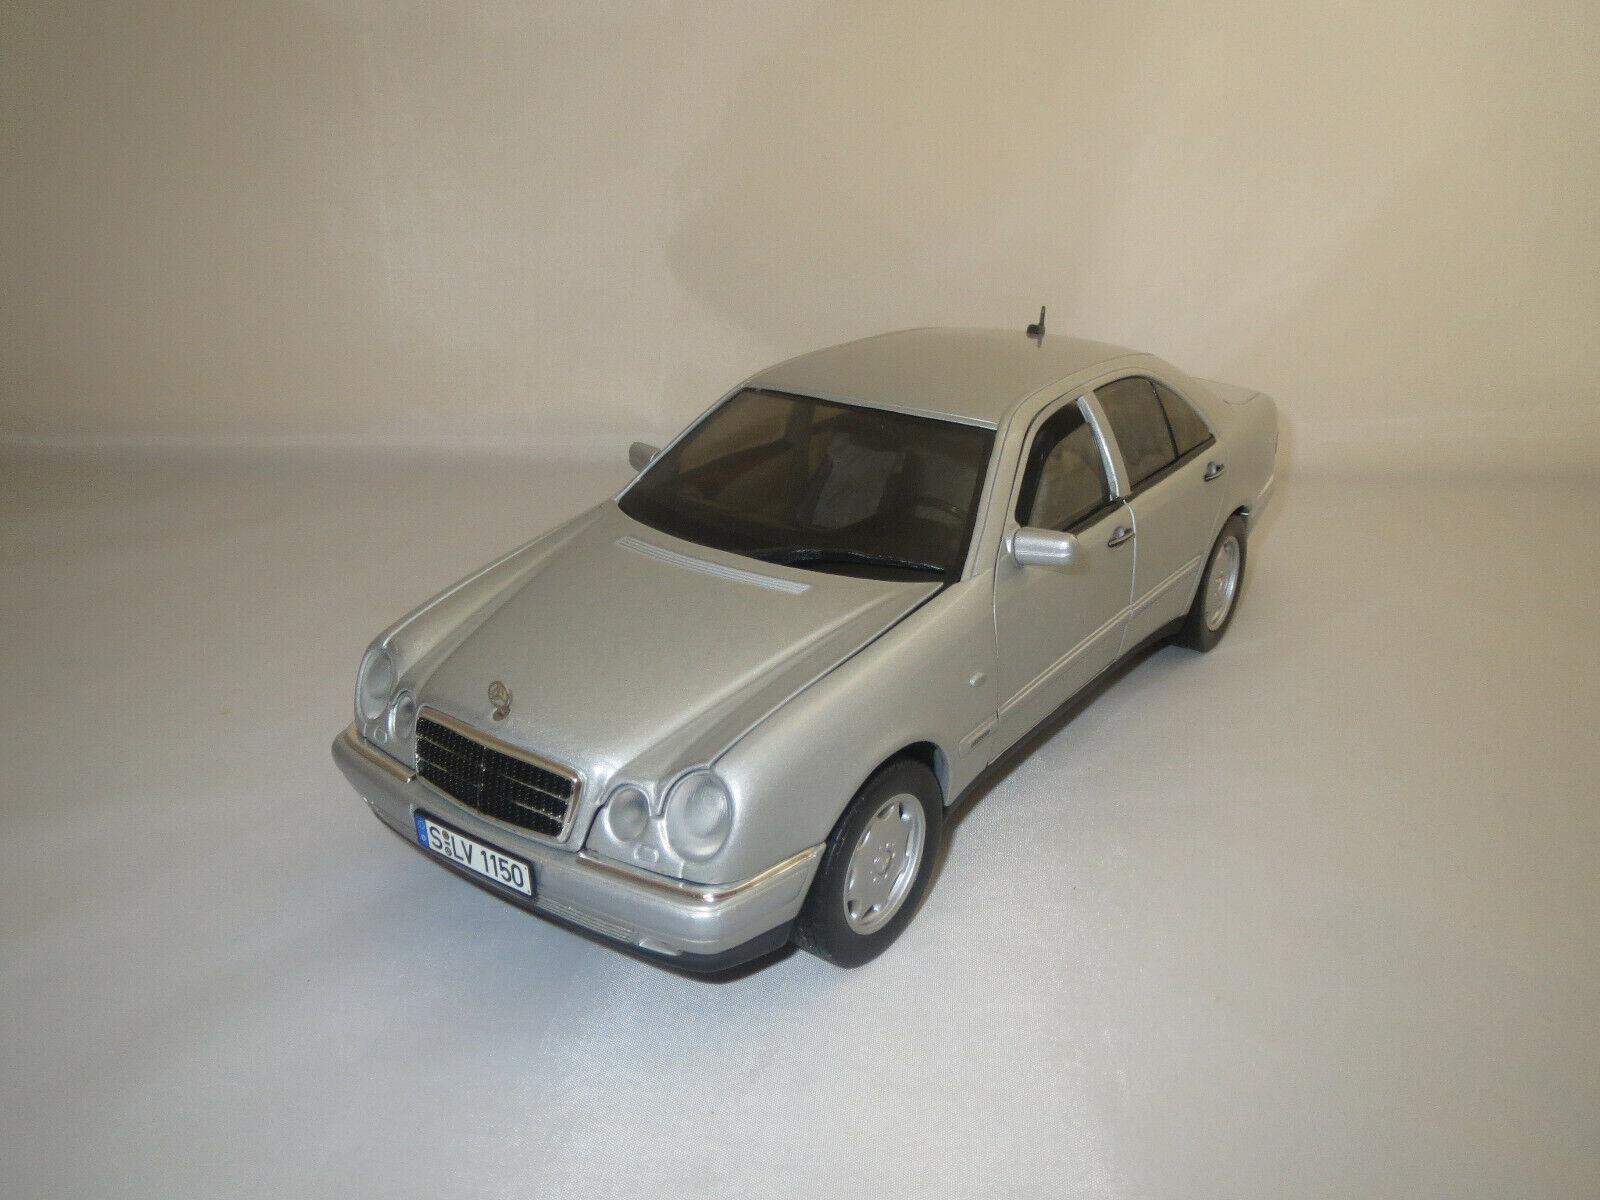 Chrono Mercedes-Benz E 320 (argent) 1 18 sans emballage